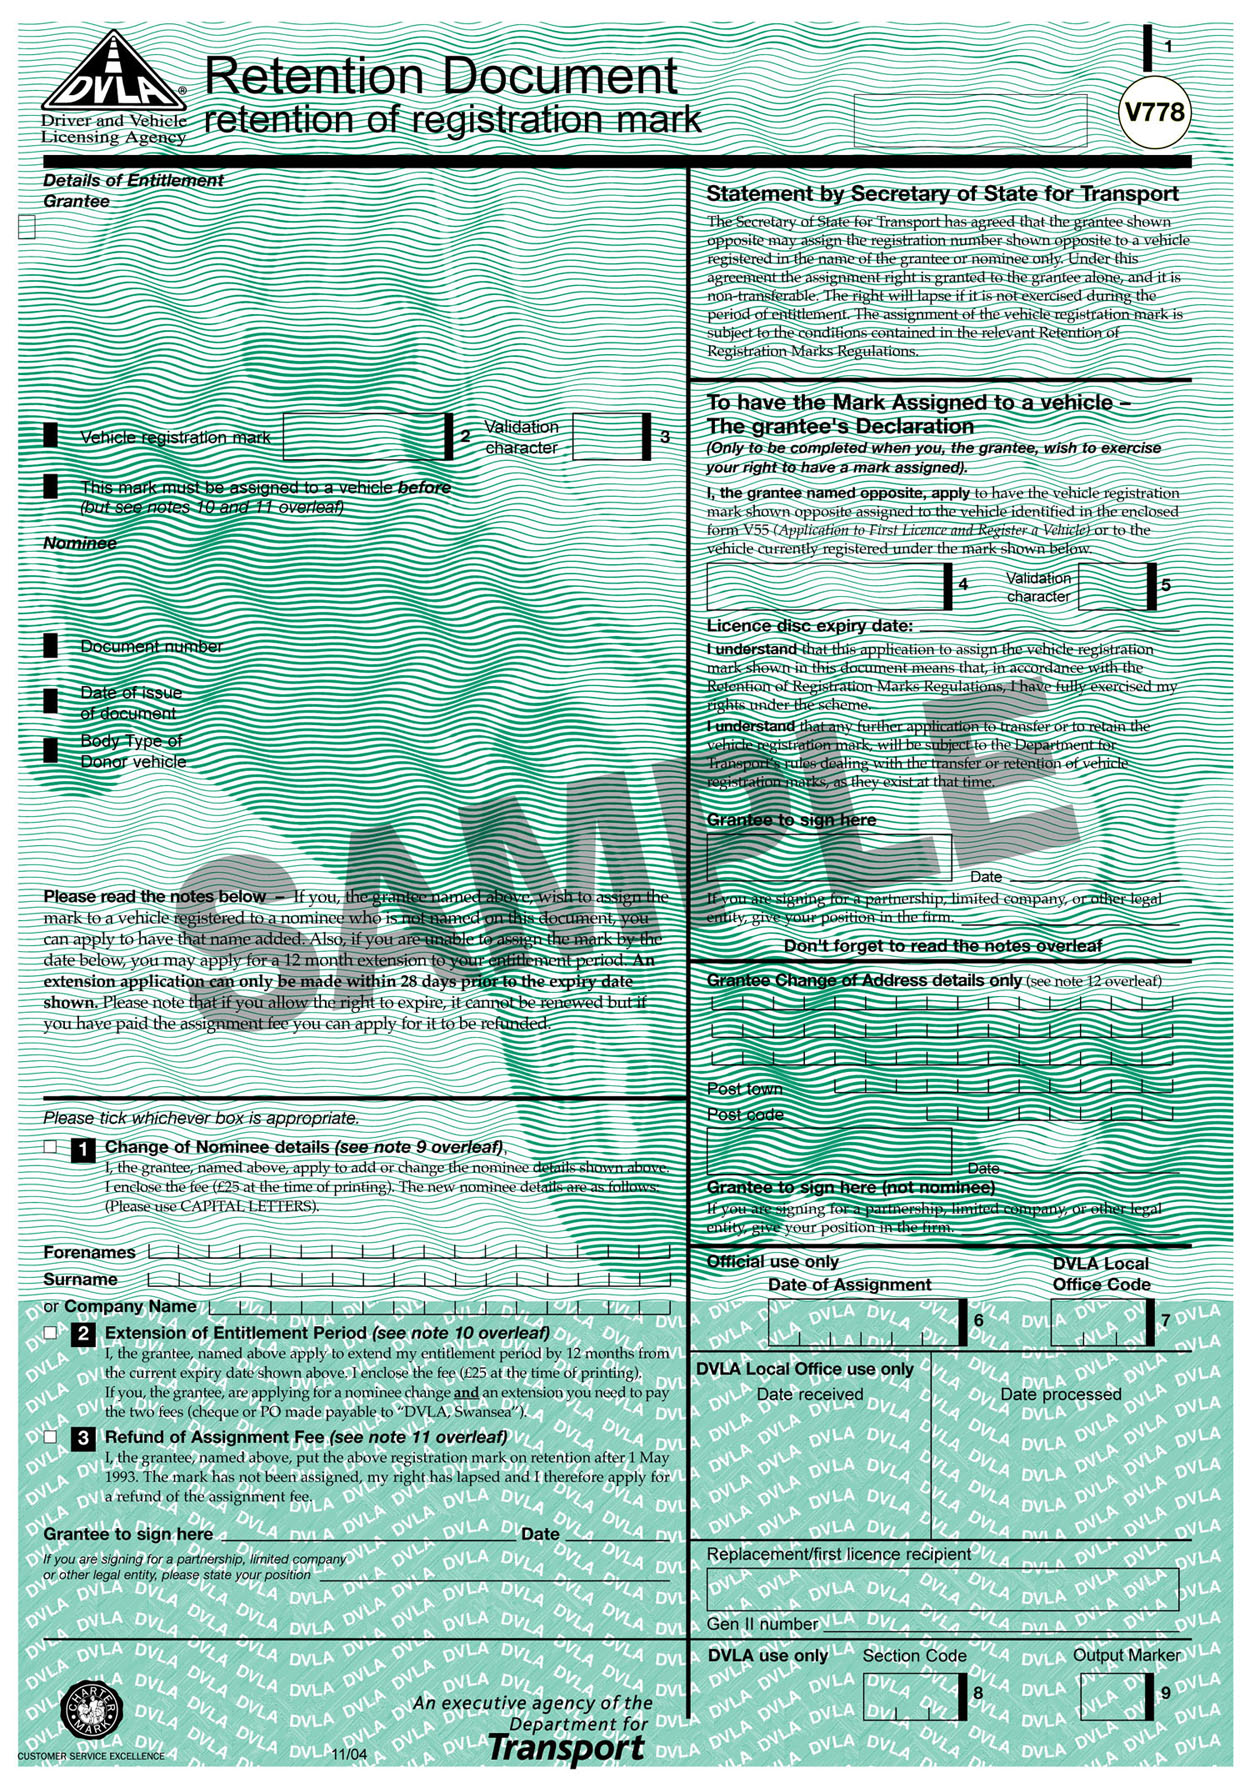 V778 Retention Document